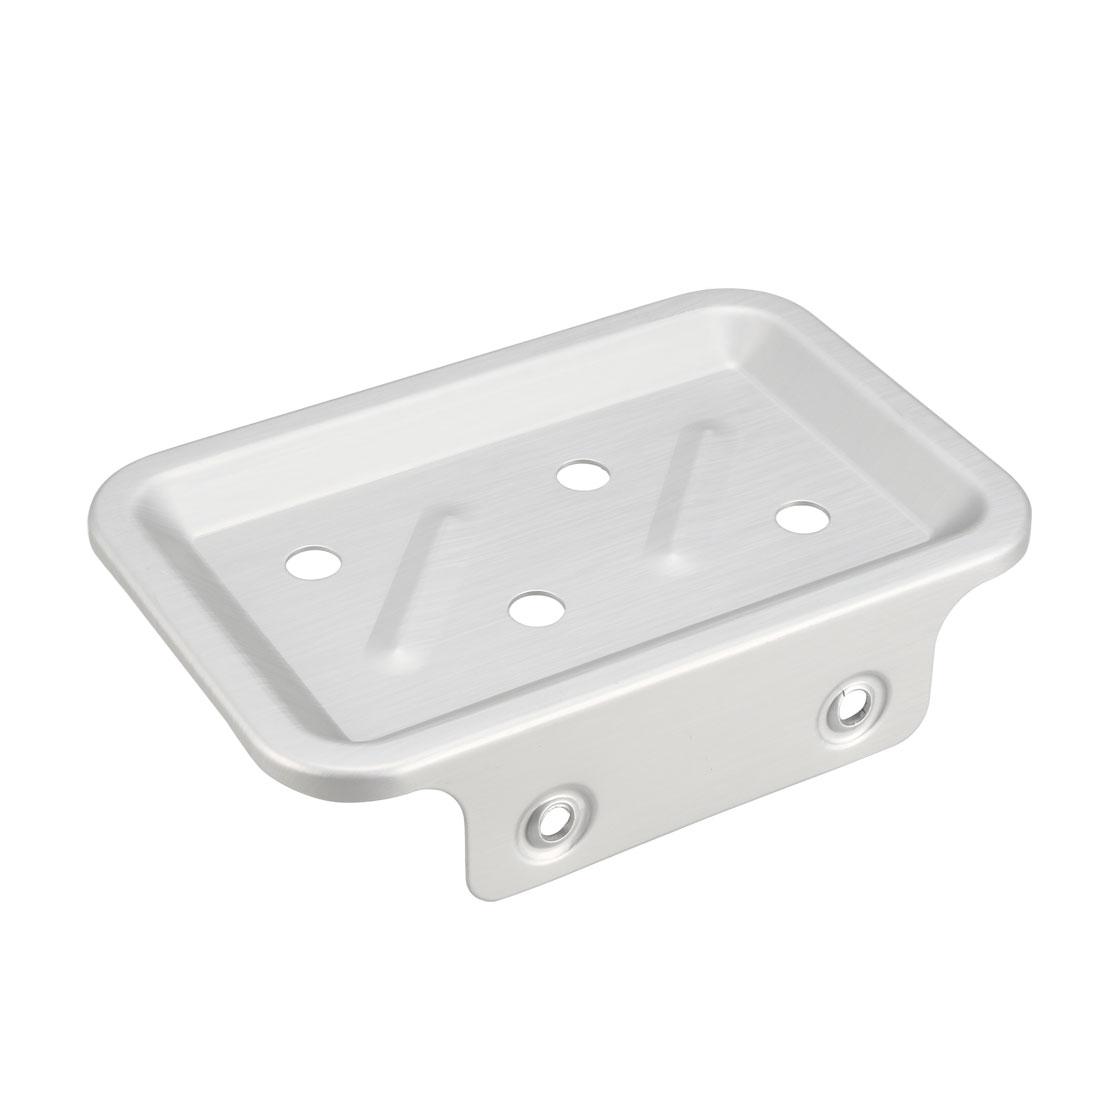 Soap Dish Holder Saver Aluminum Wall Mounted Tray with Installation Kits Silver